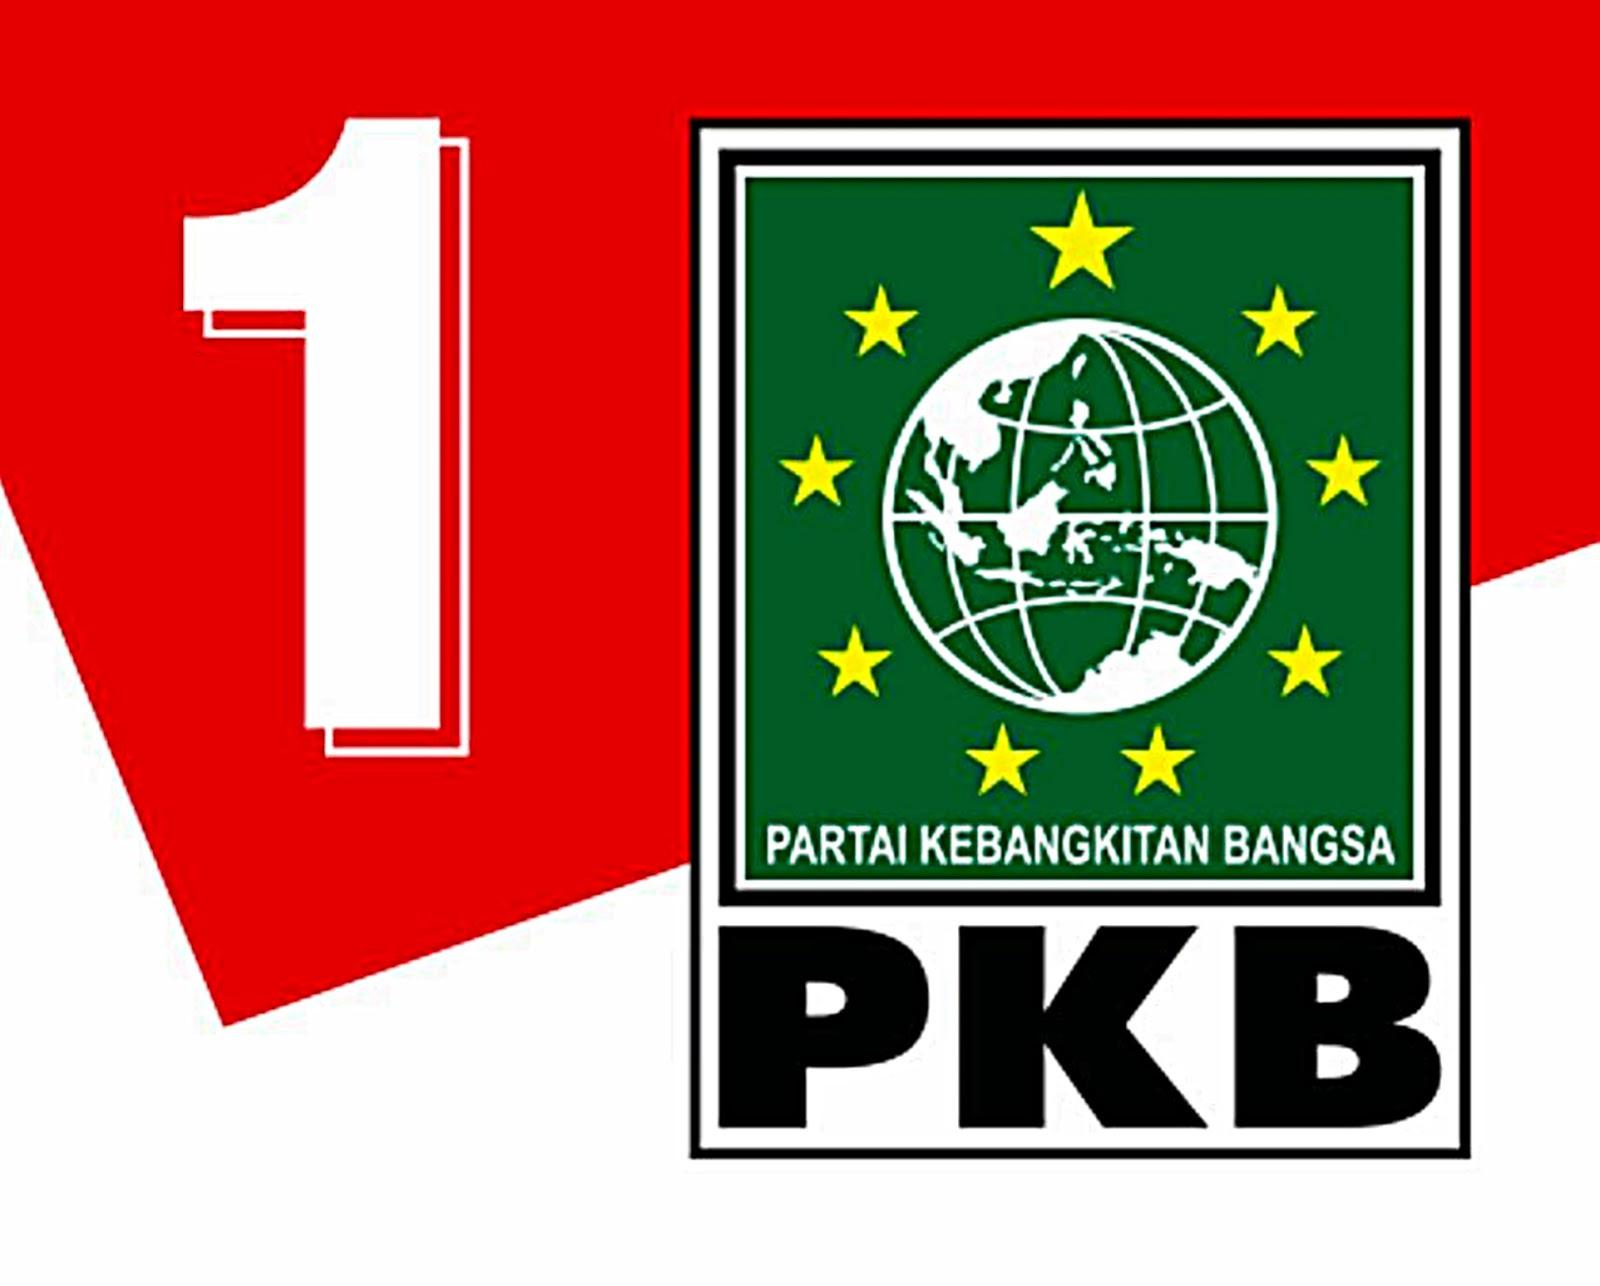 Kuasai Semua Dapil, PKB Rebut Sembilan Kursi di DPRD Kebumen